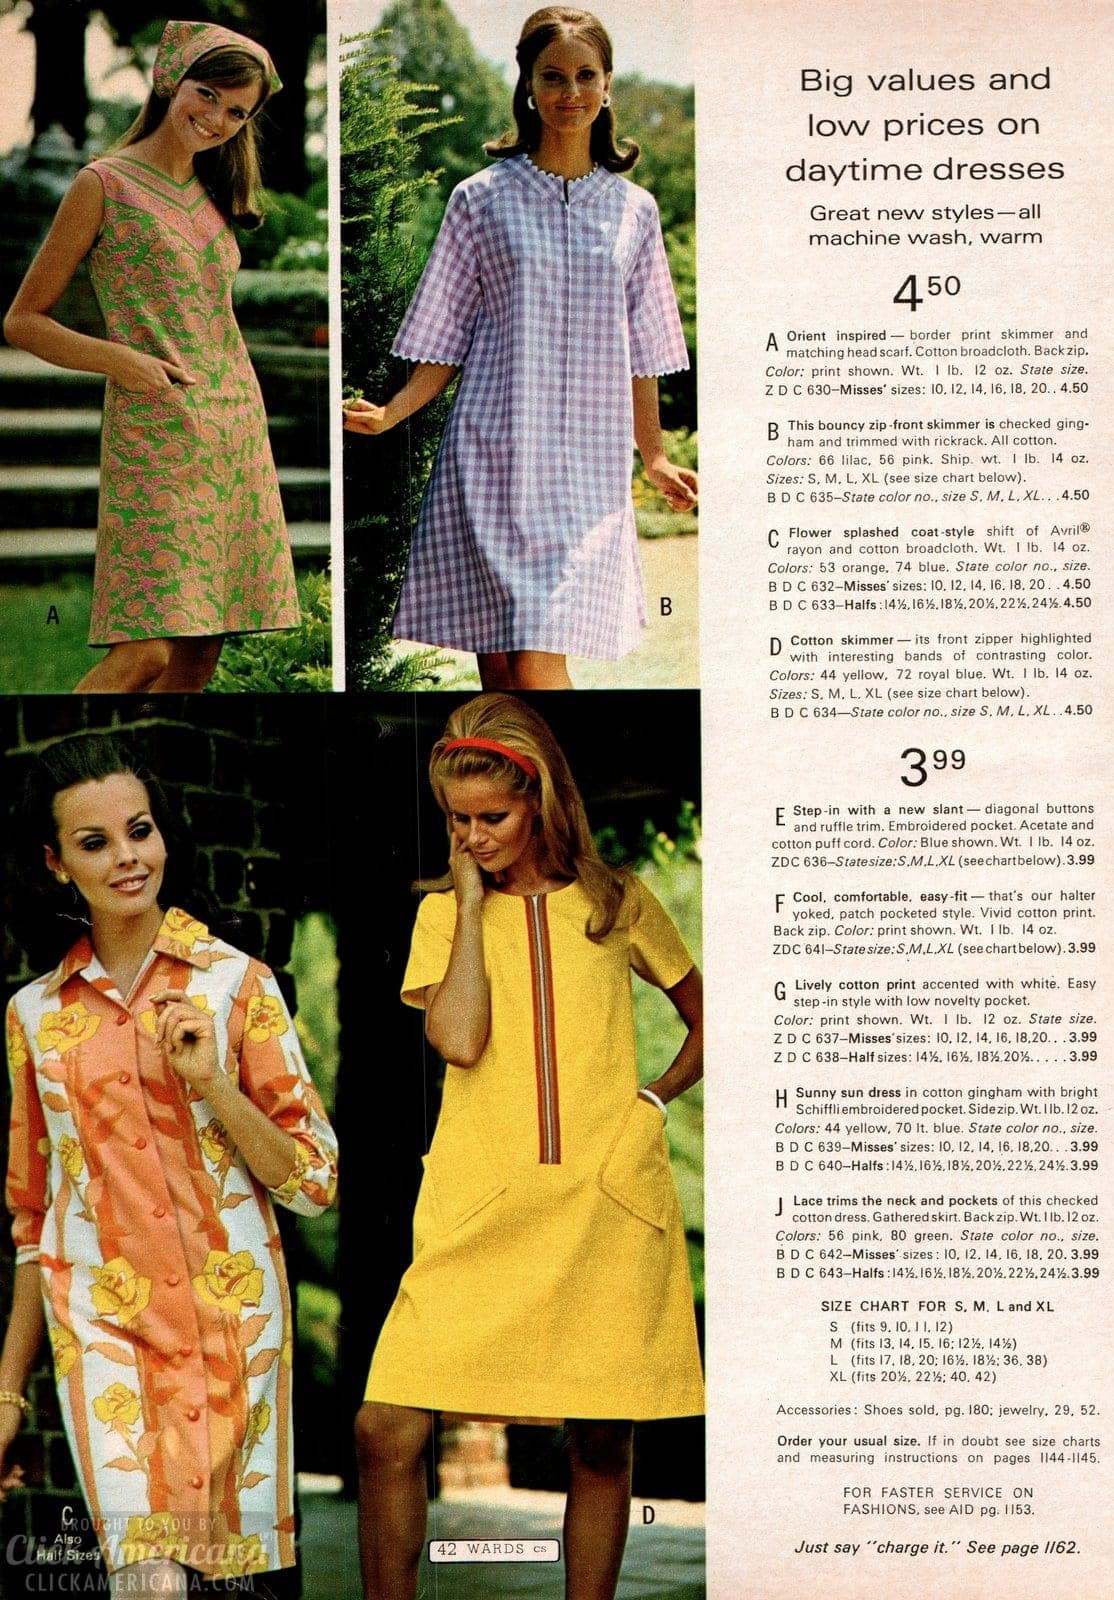 Vintage daytime dresses - skimmers, sundresses and more